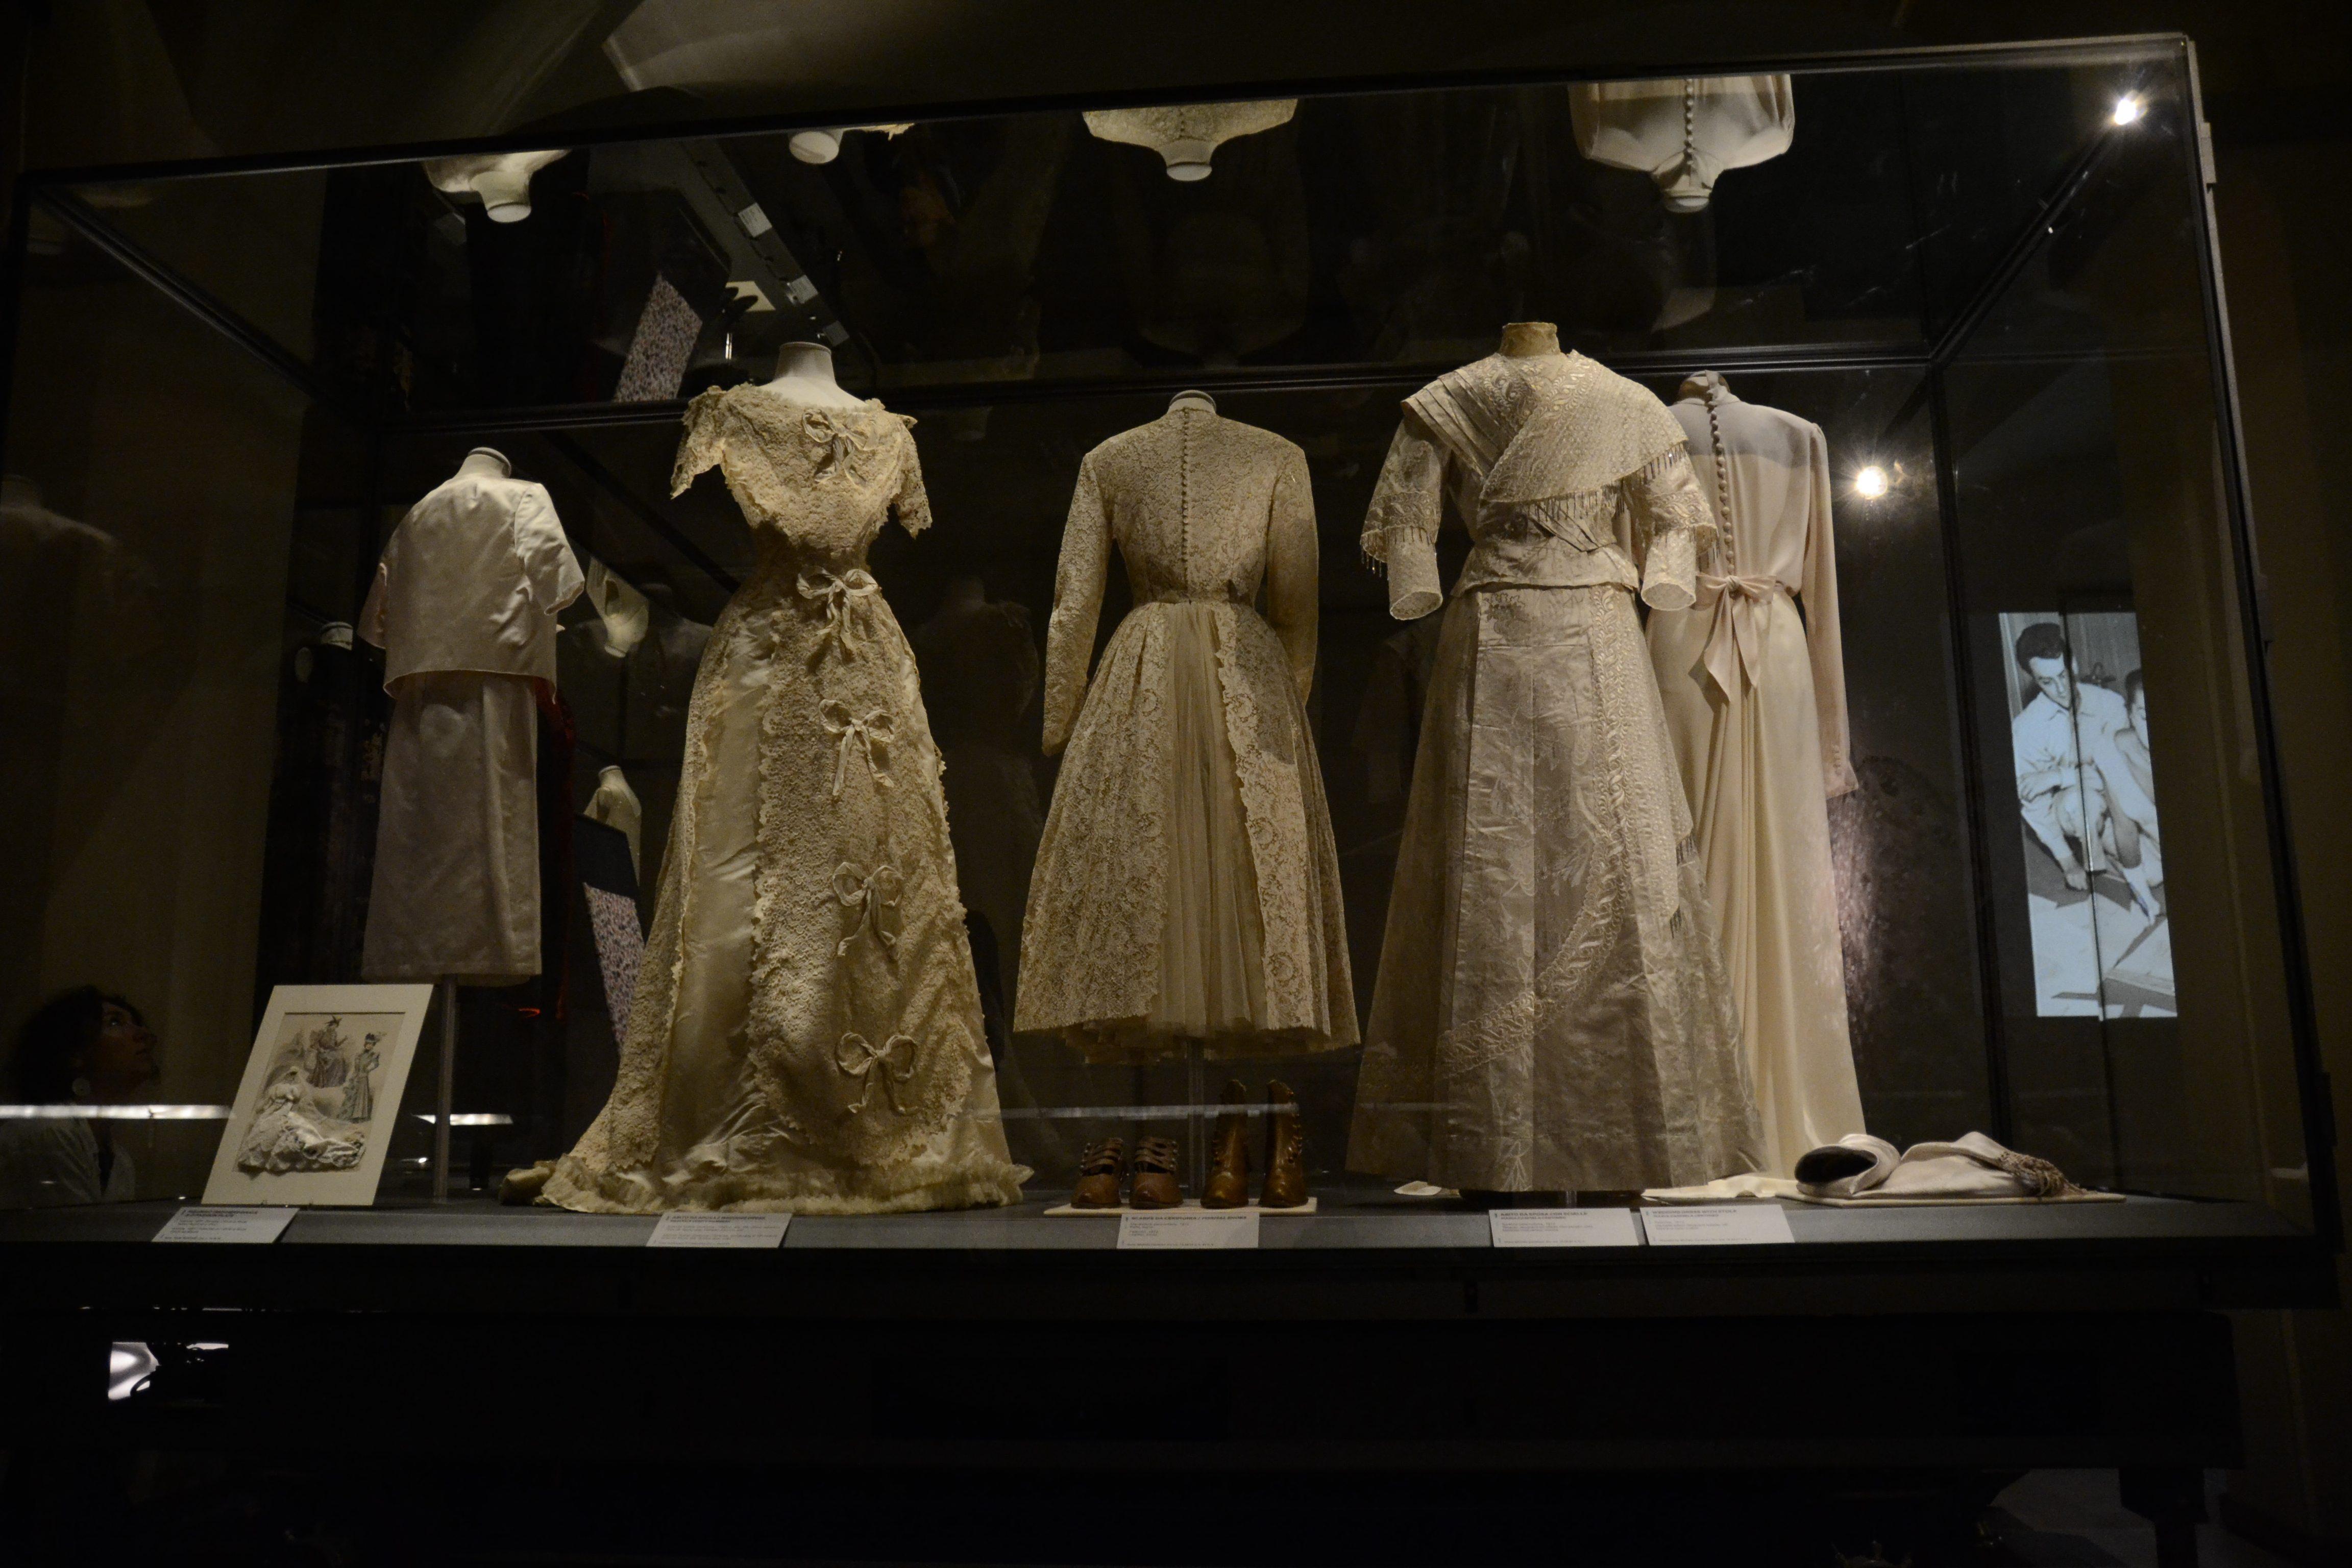 1554130826 heritagemuseo del tessuto prato1